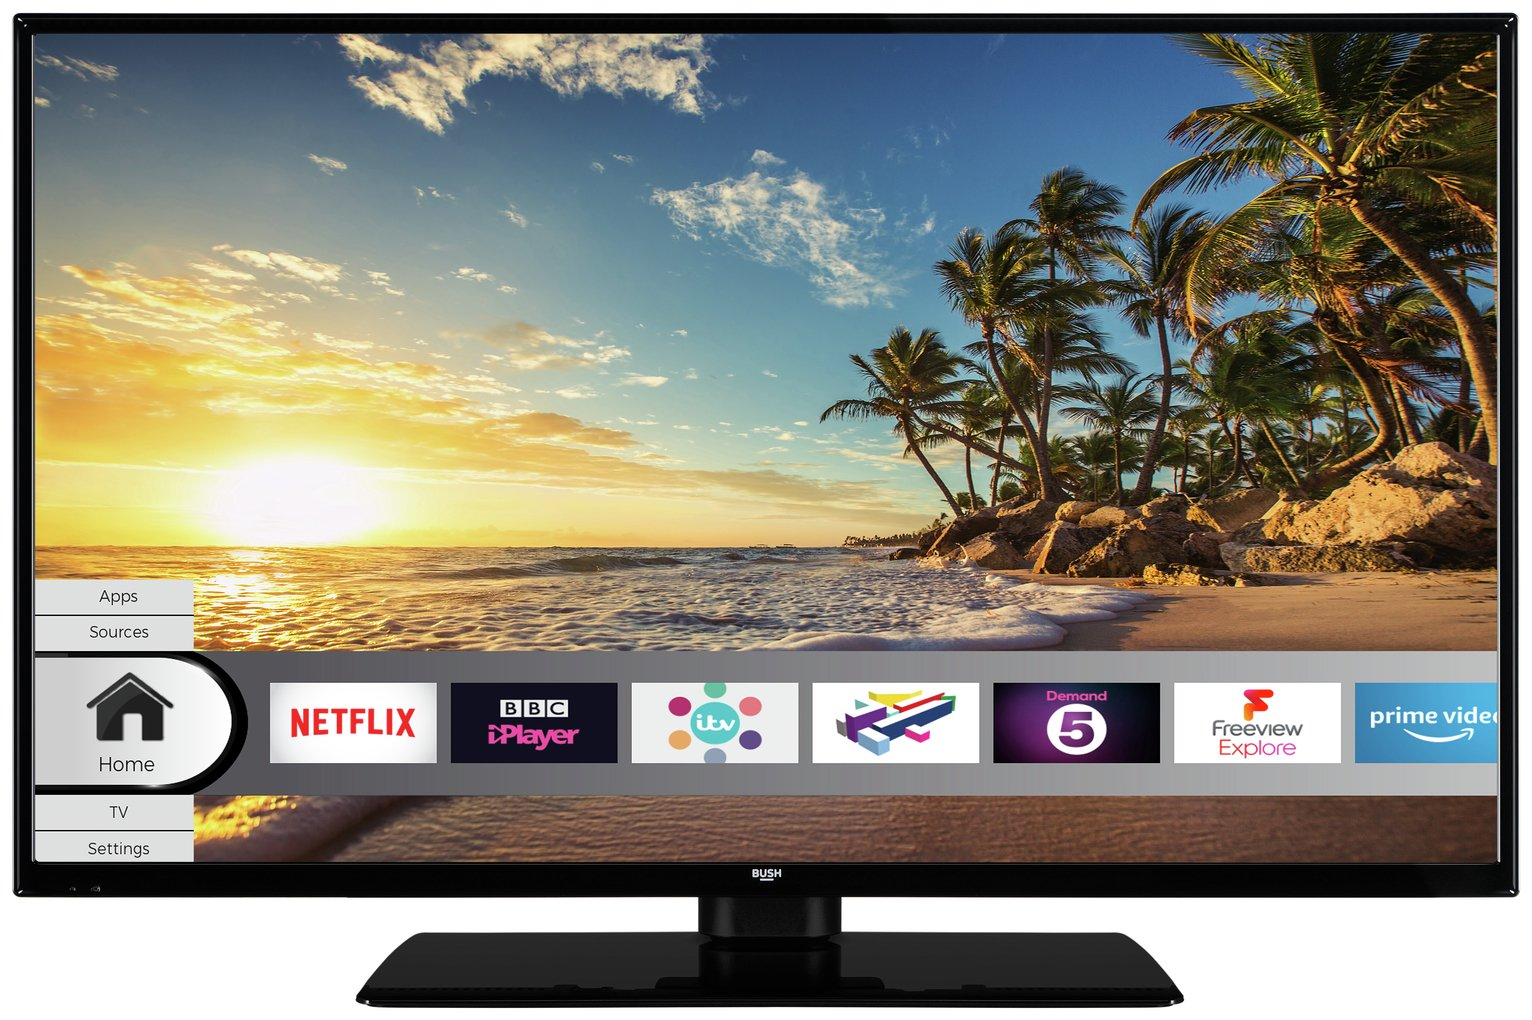 Bush 40 Inch Smart Full HD TV Results for inch tv